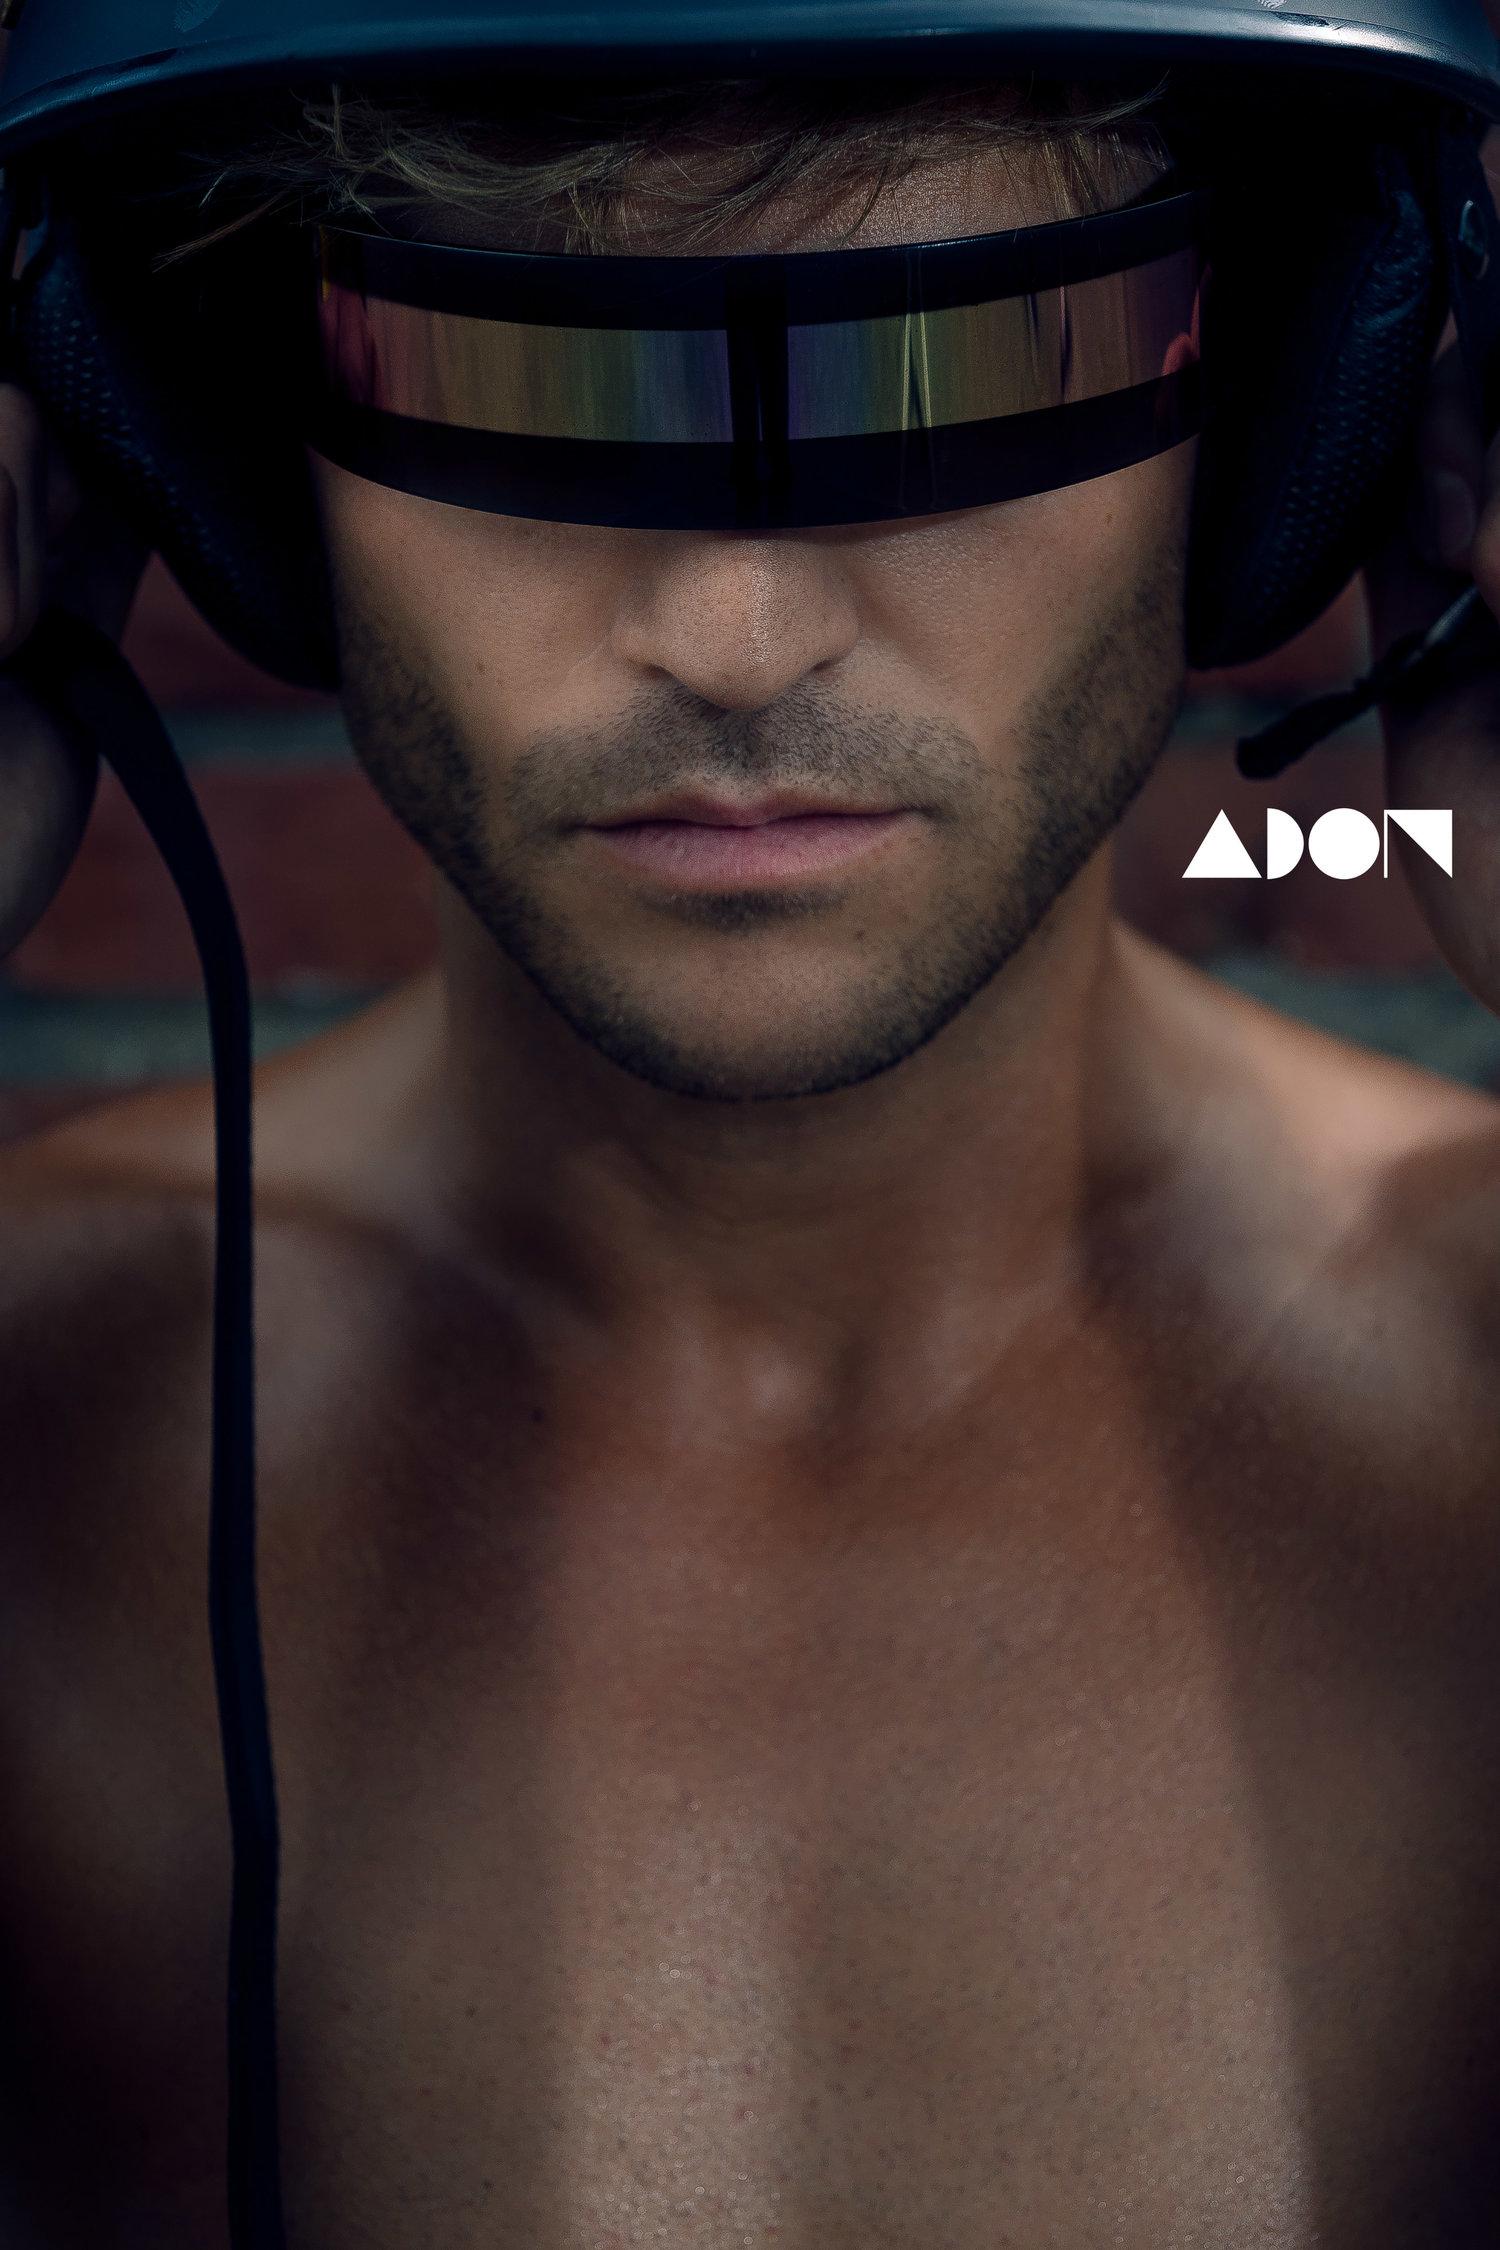 Adon Exclusive: Model Nester Bravo By Nico Gonzalez